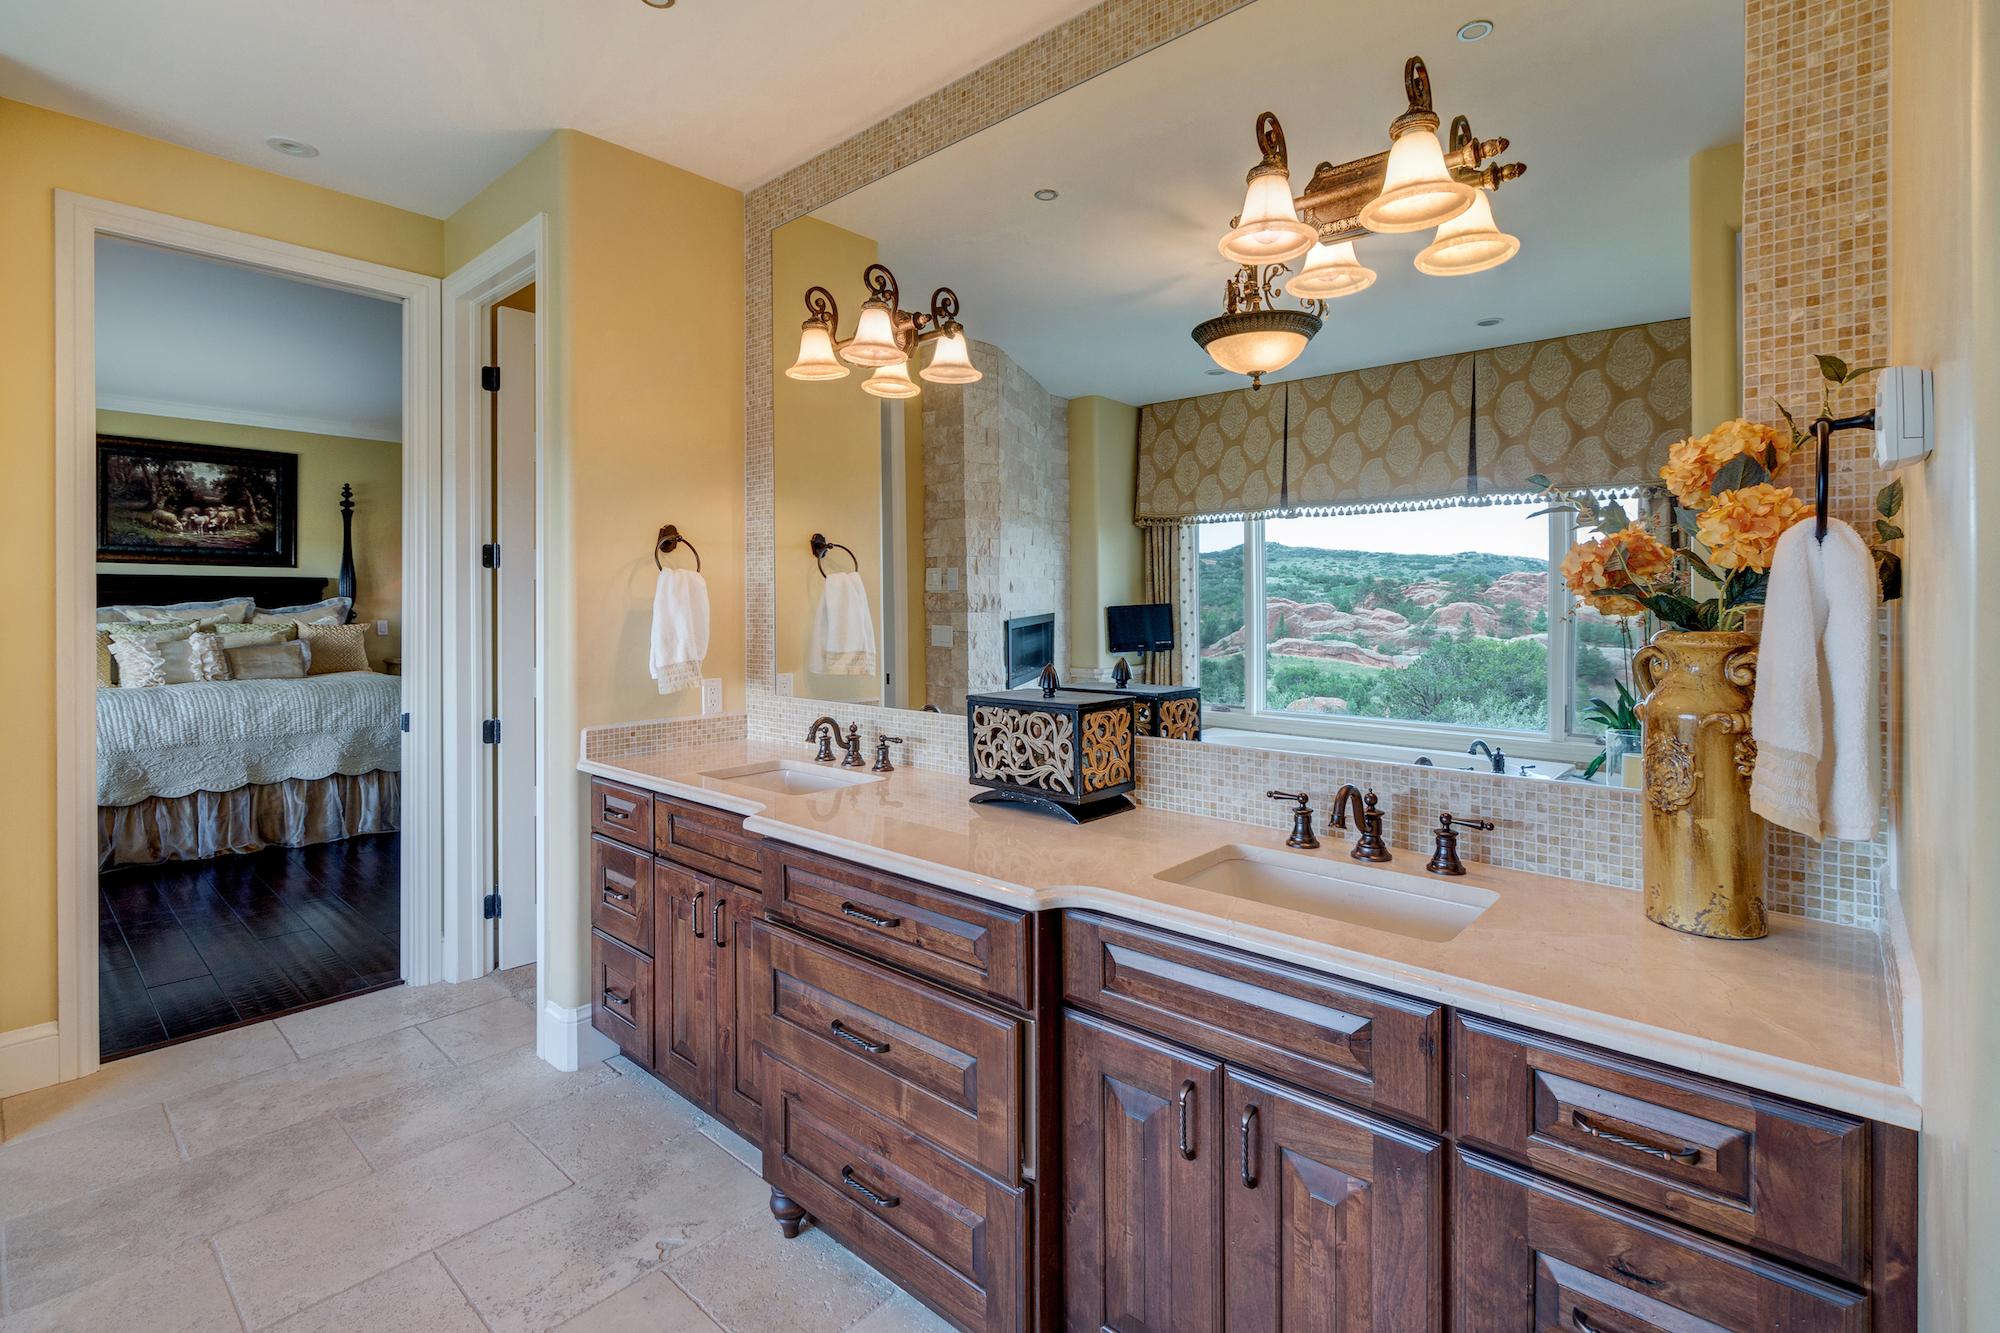 016-Dual vanities in 5pc master bath to include steam shower.jpg